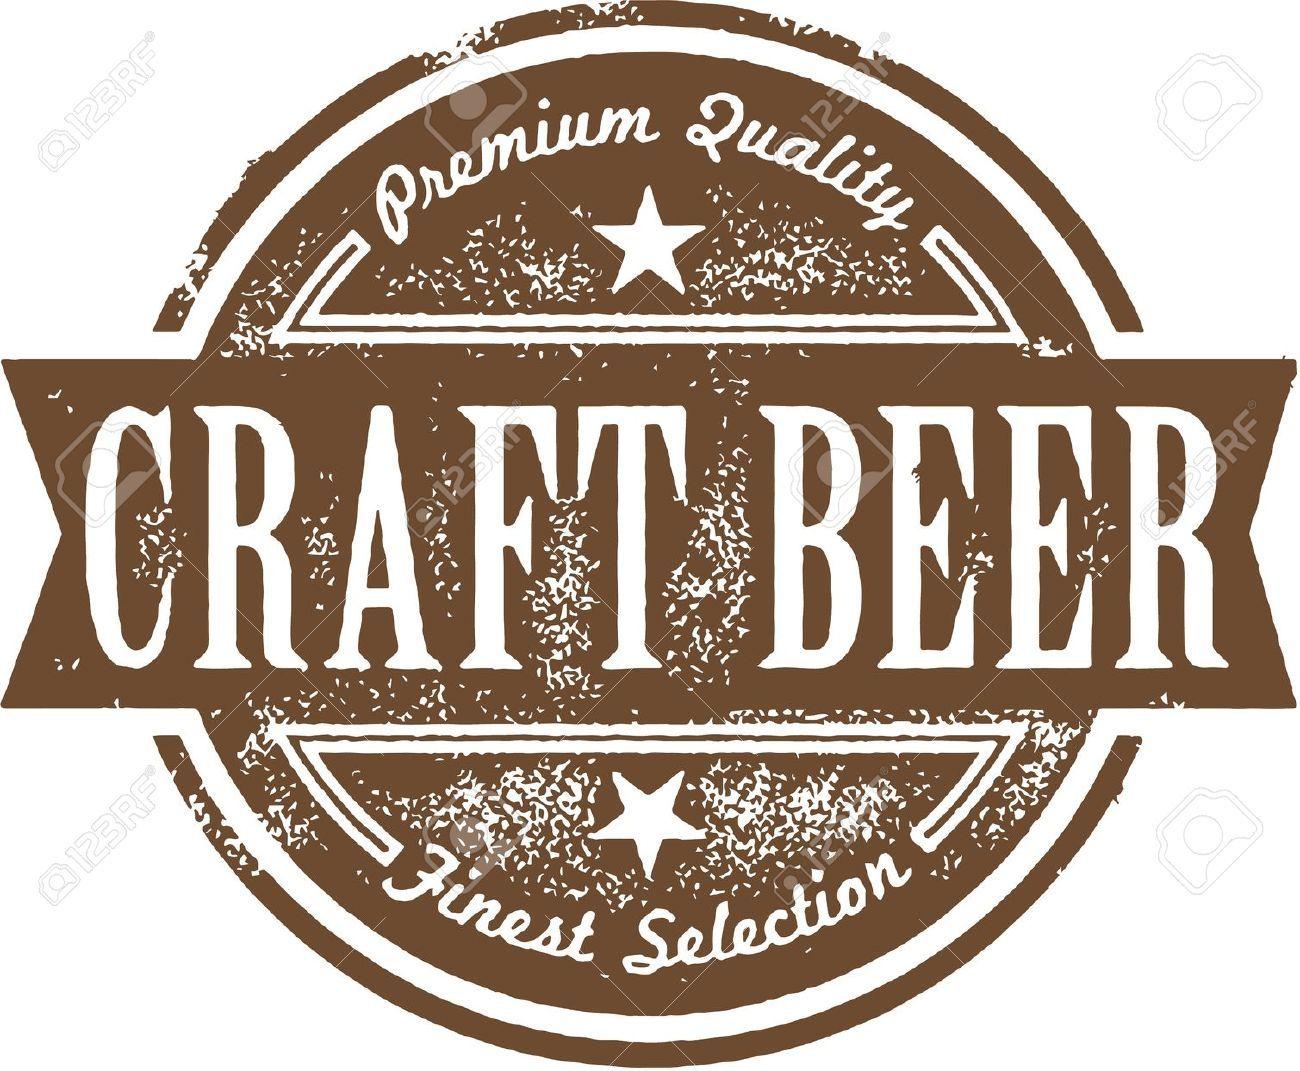 Craft Beer International.